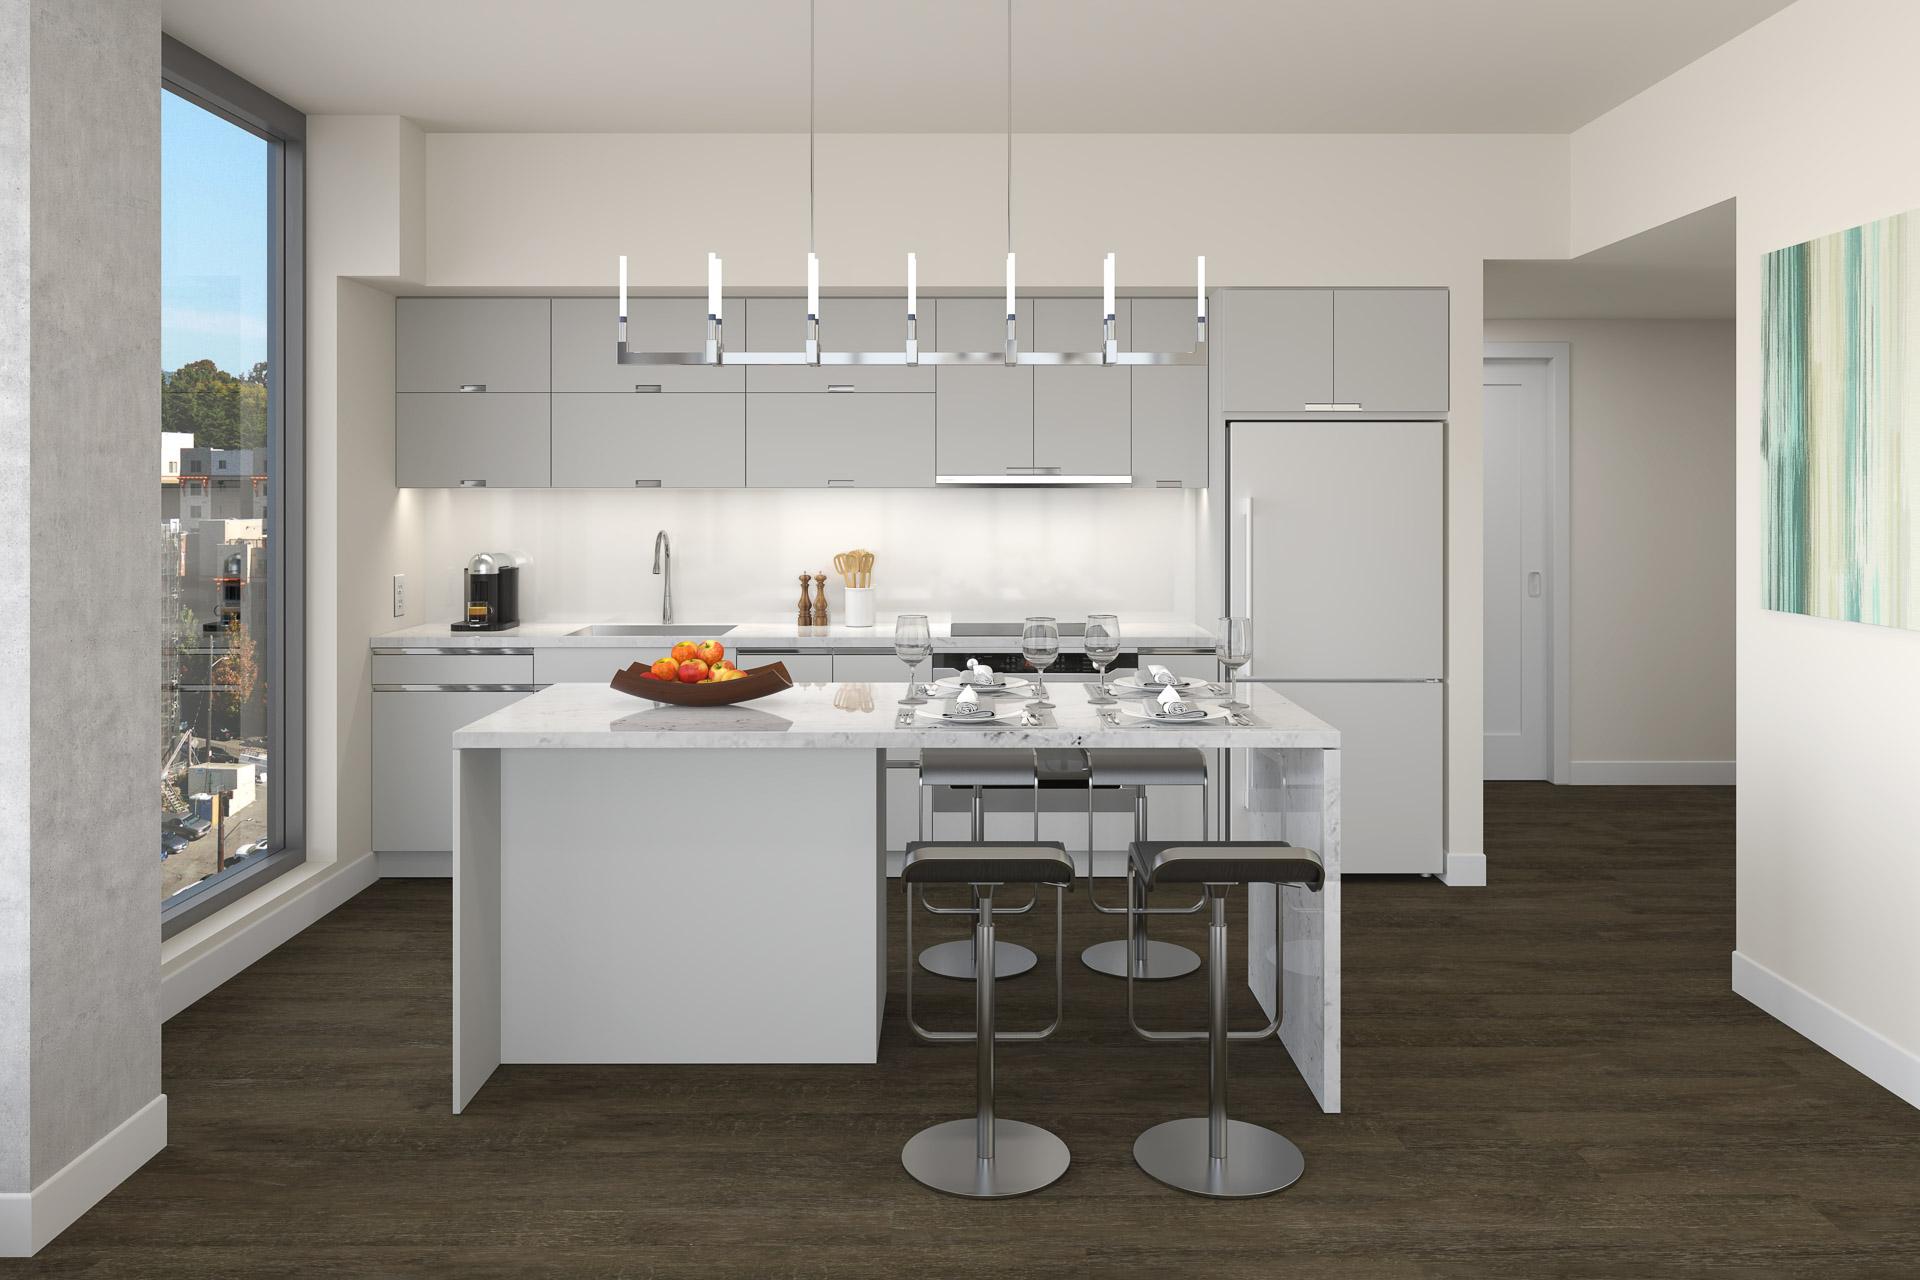 KODACondos_Interior_Unit1705_Kitchen_Cam1_Medium_032219